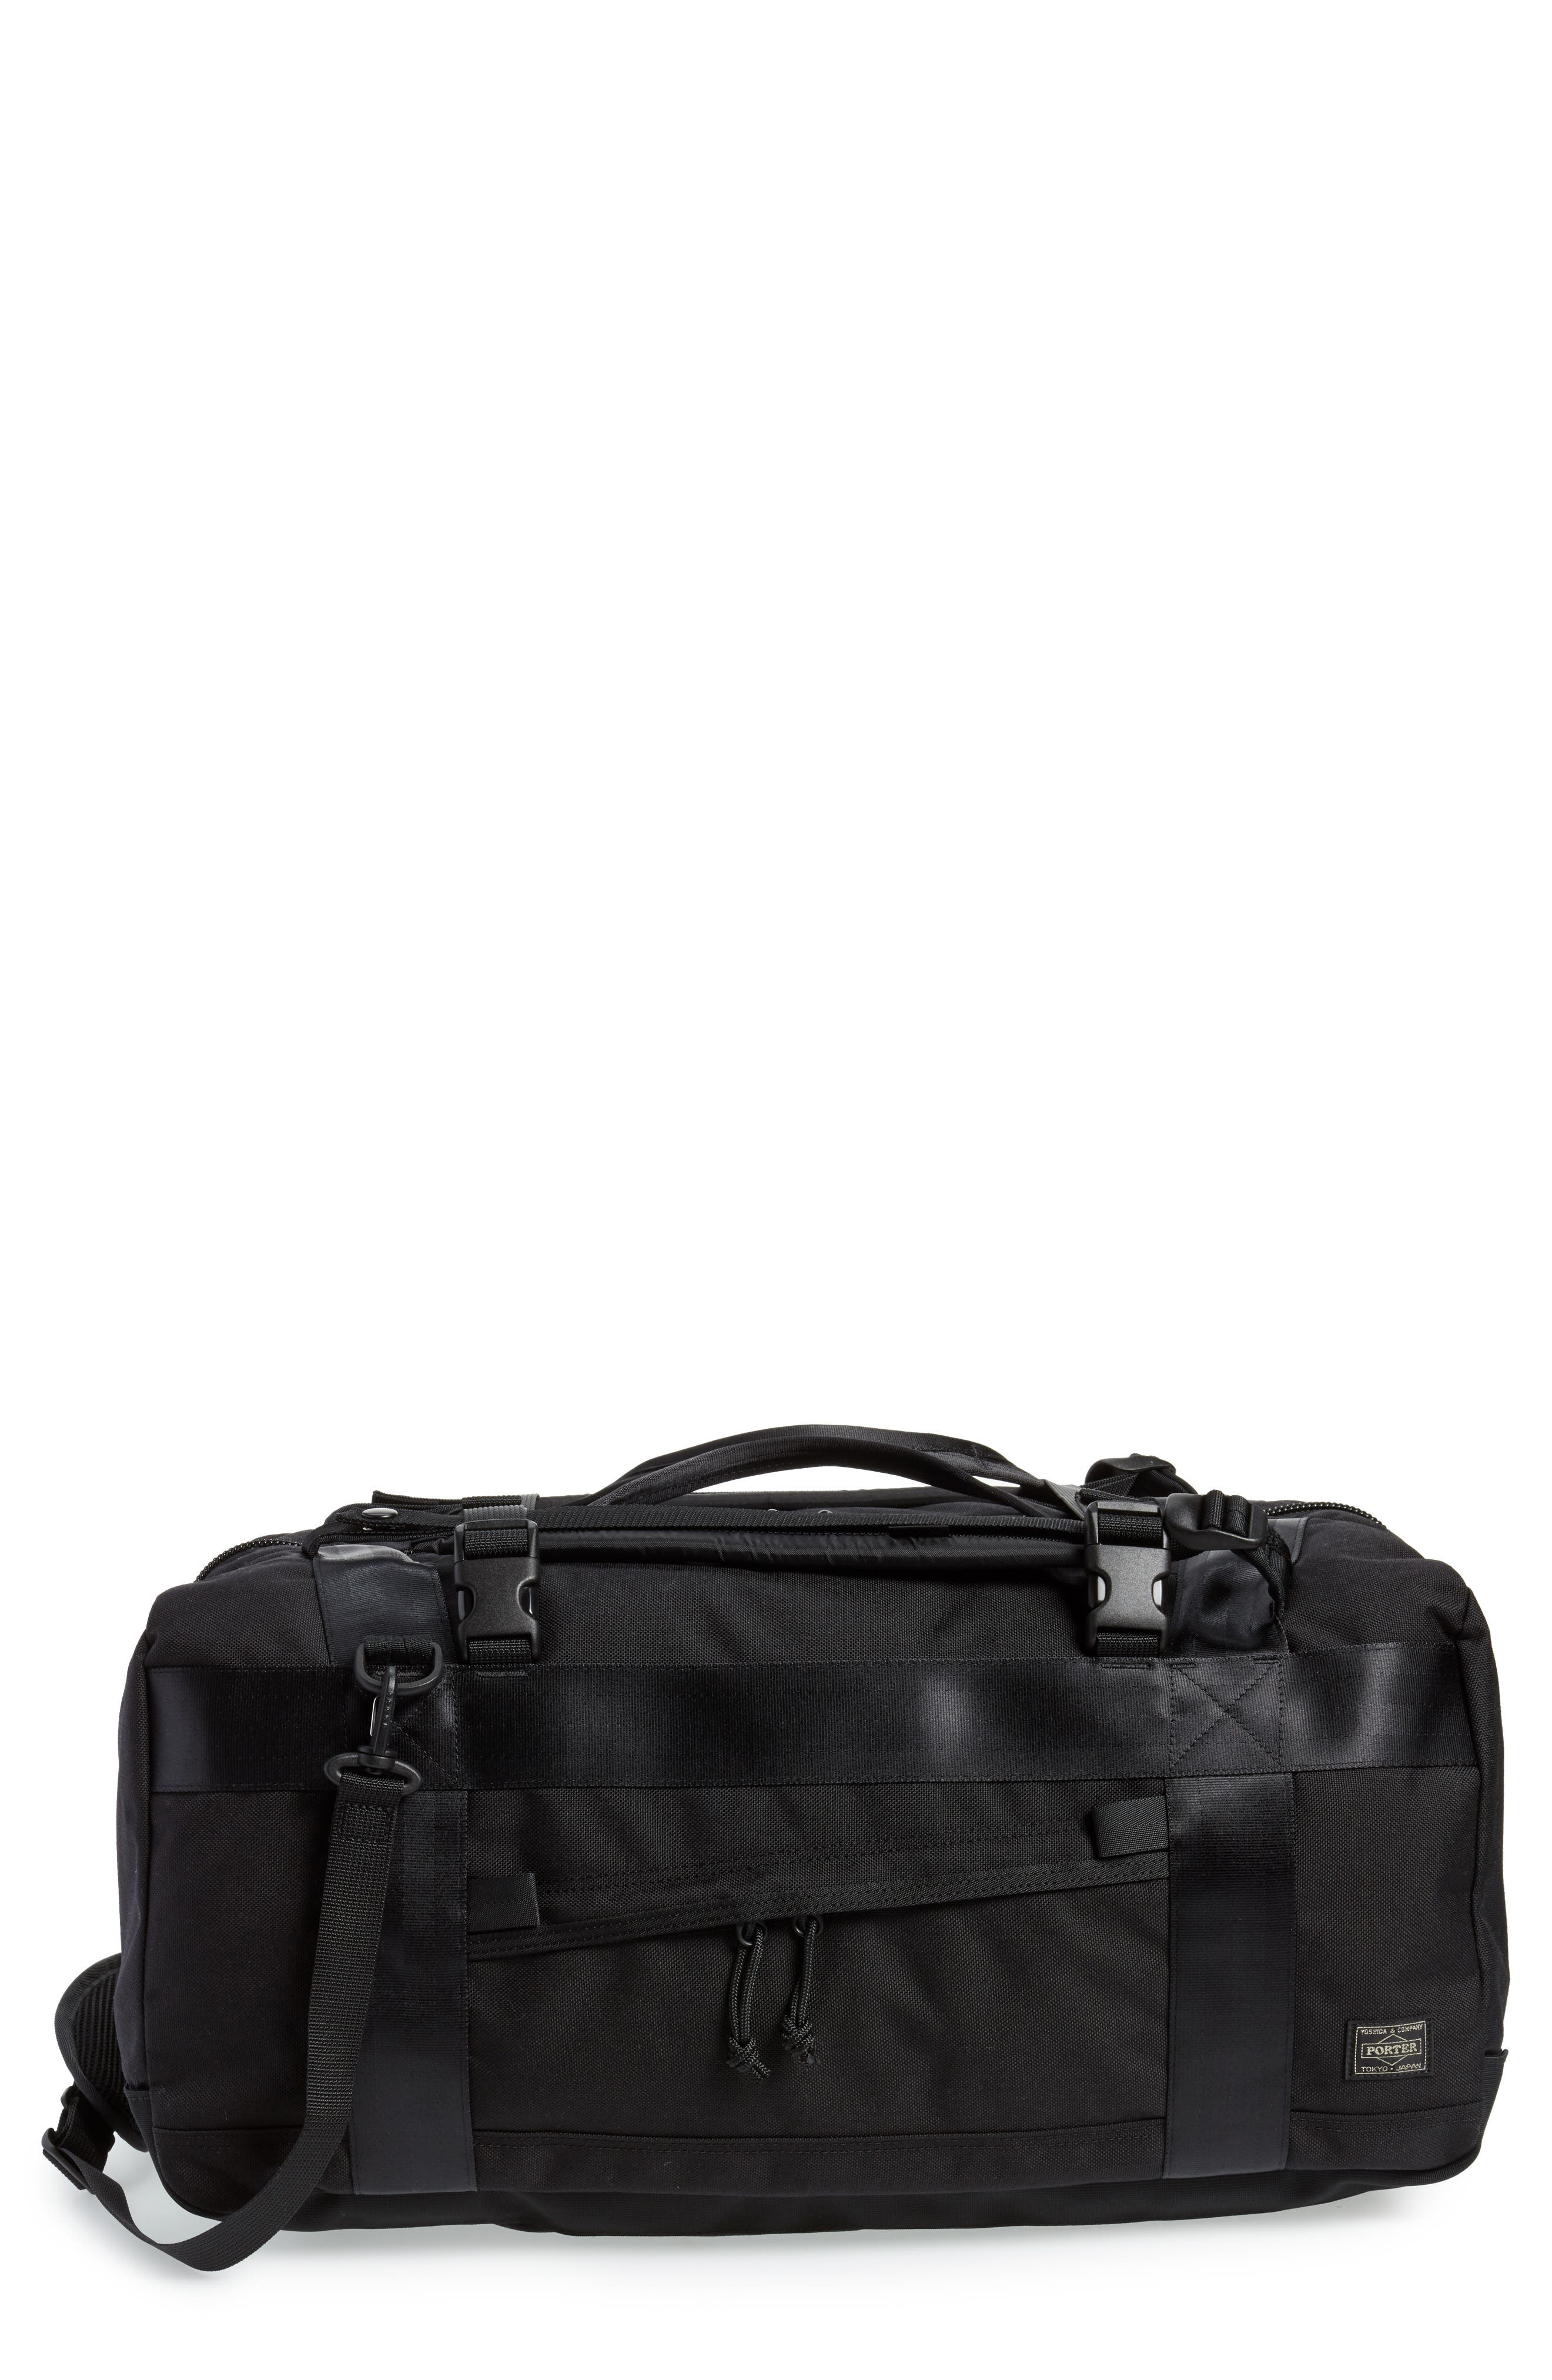 Porter-Yoshida & Co. Boothpack Convertible Duffel Bag,                             Main thumbnail 1, color,                             BLACK